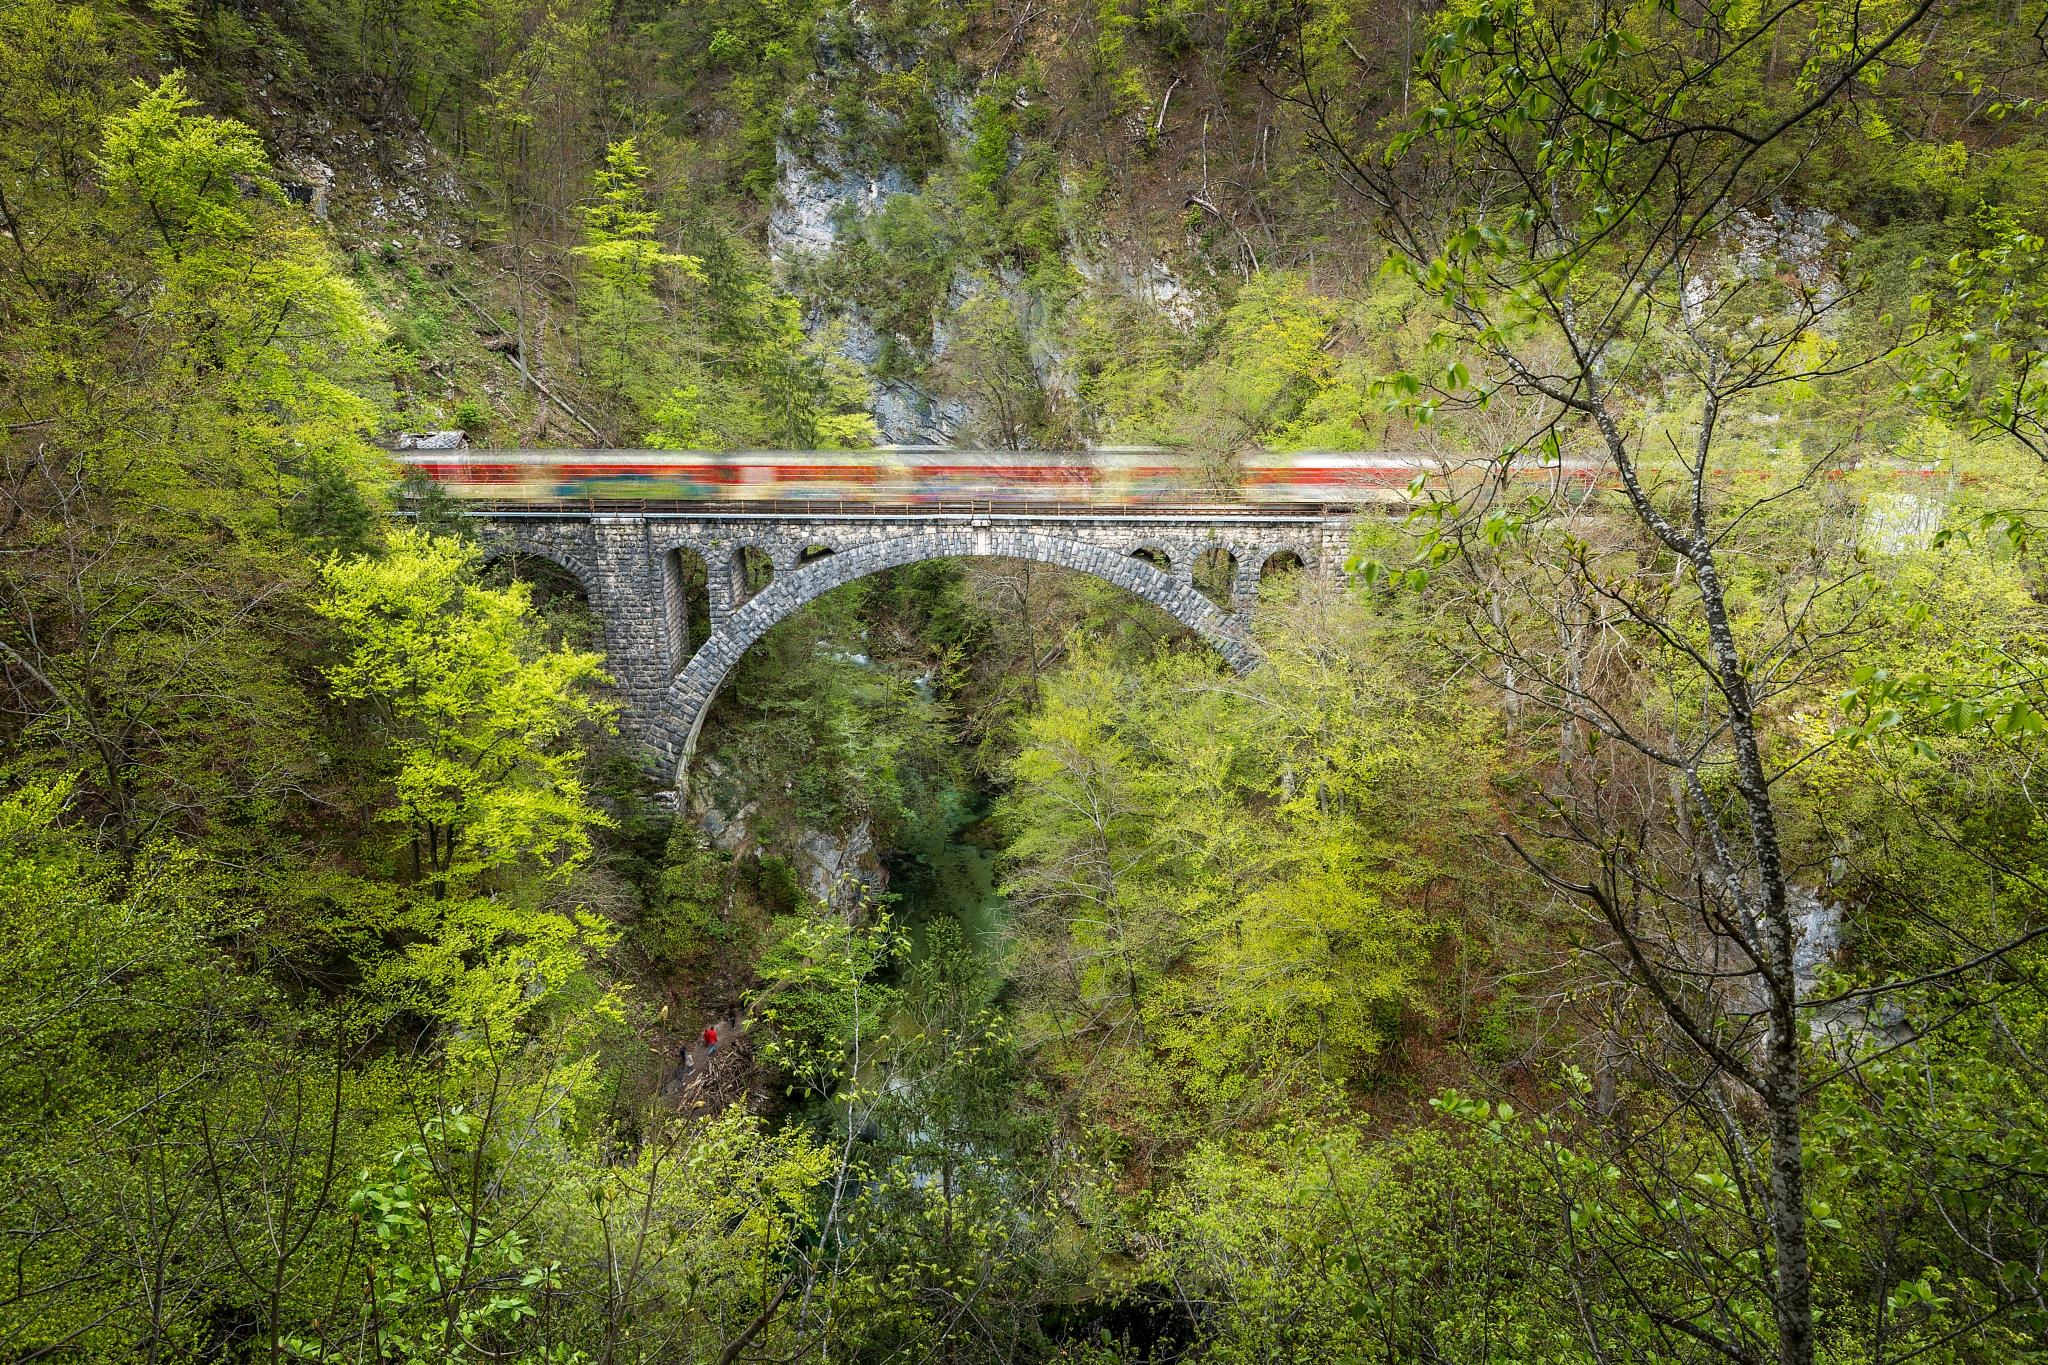 Fast train over Vintgar gorge by Bor Rojnik